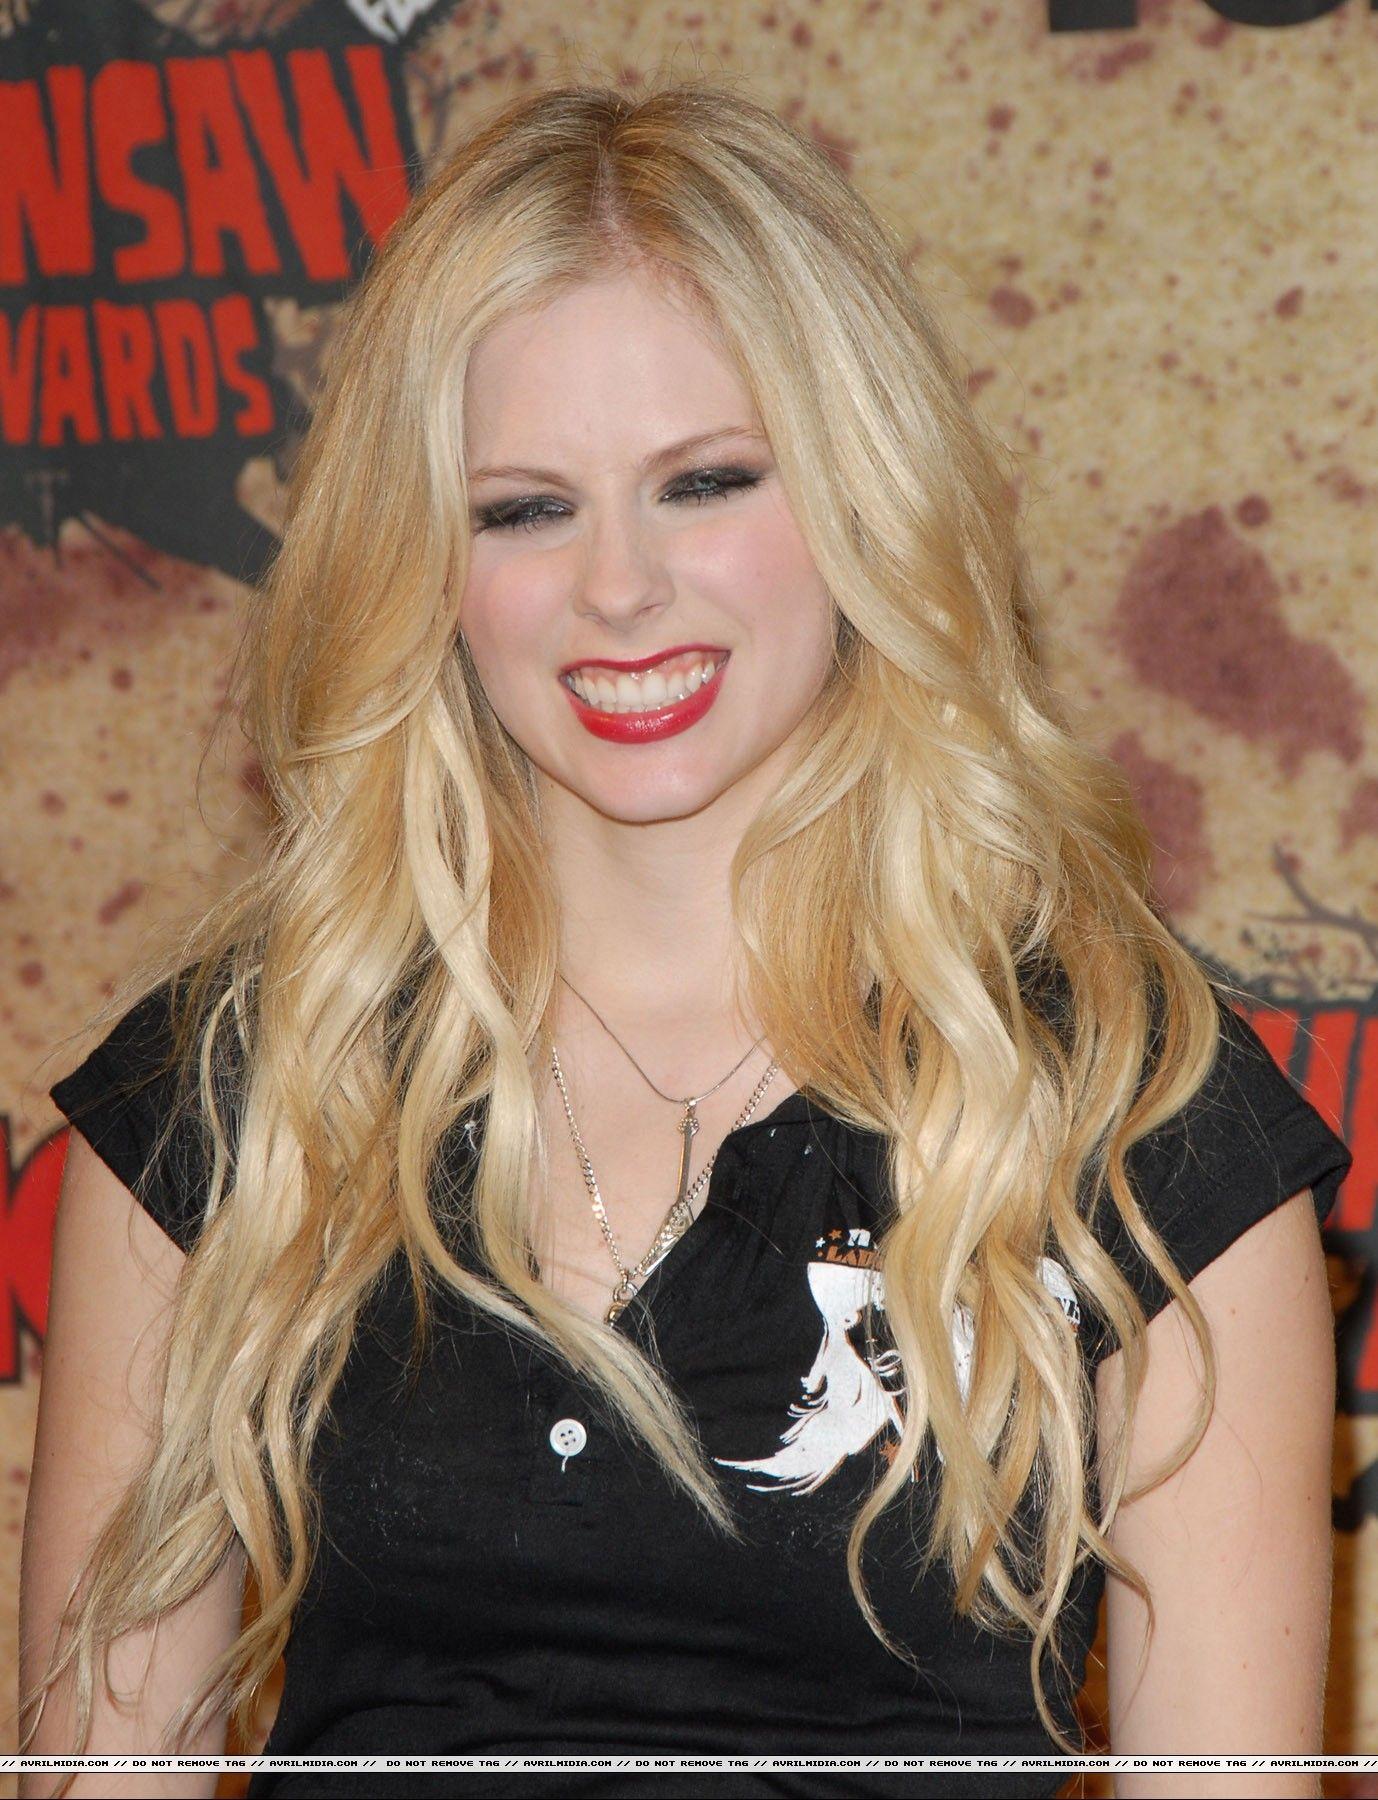 2019 Avril Lavigne nude photos 2019